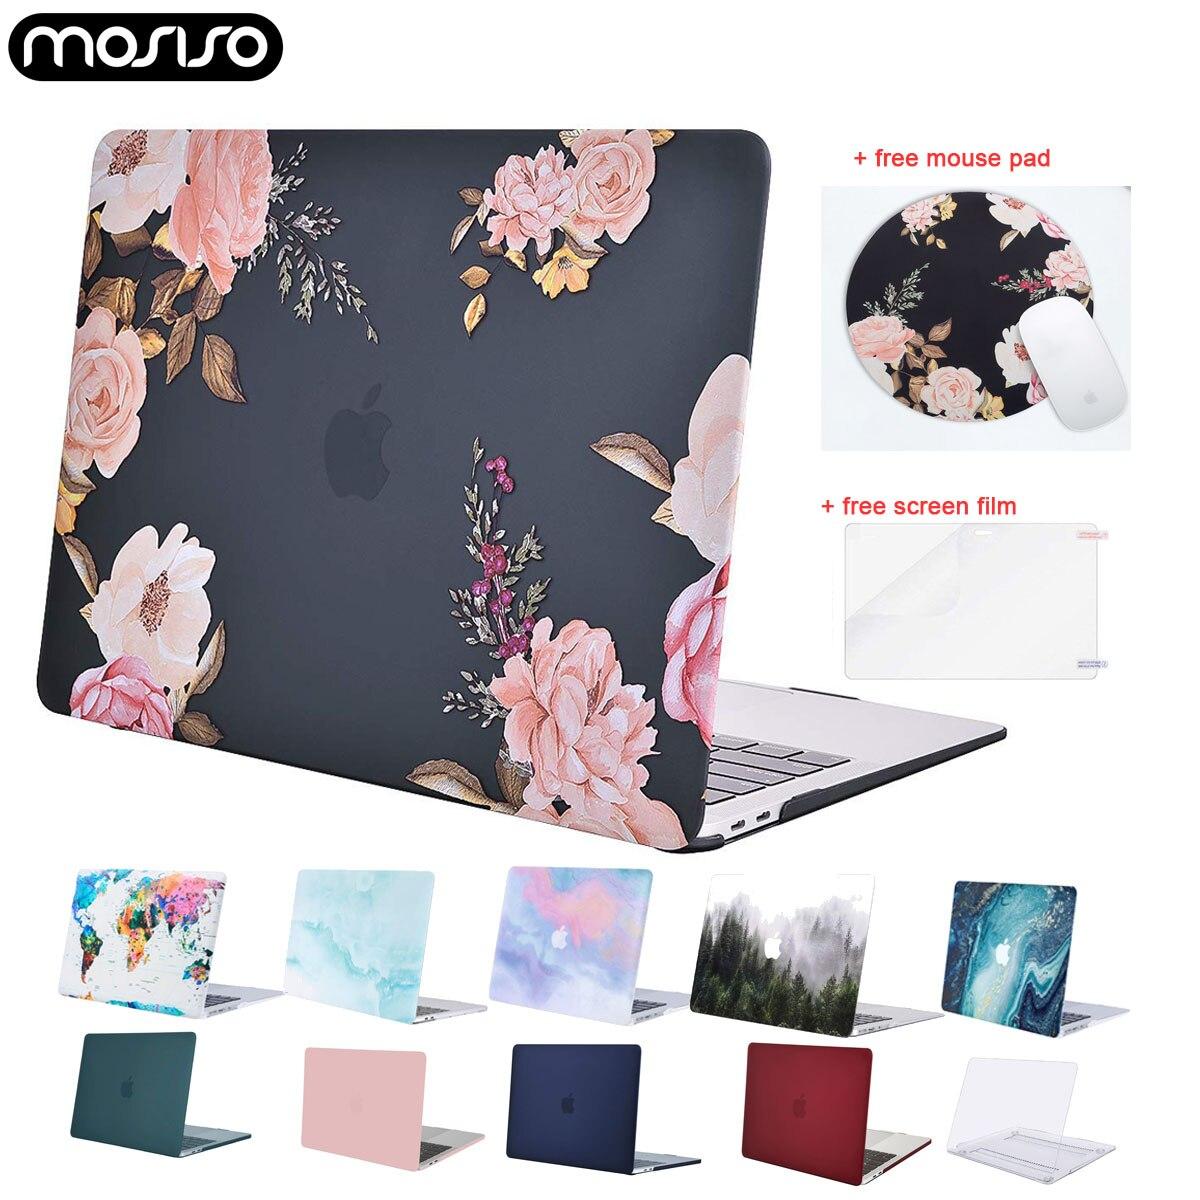 MOSISO Laptop Hard Case For Macbook Air Retina Pro 13 15 Touch Bar A1706 A1989 A2159 A1708 A1932 2019 New Mac Air 13 Case Cover